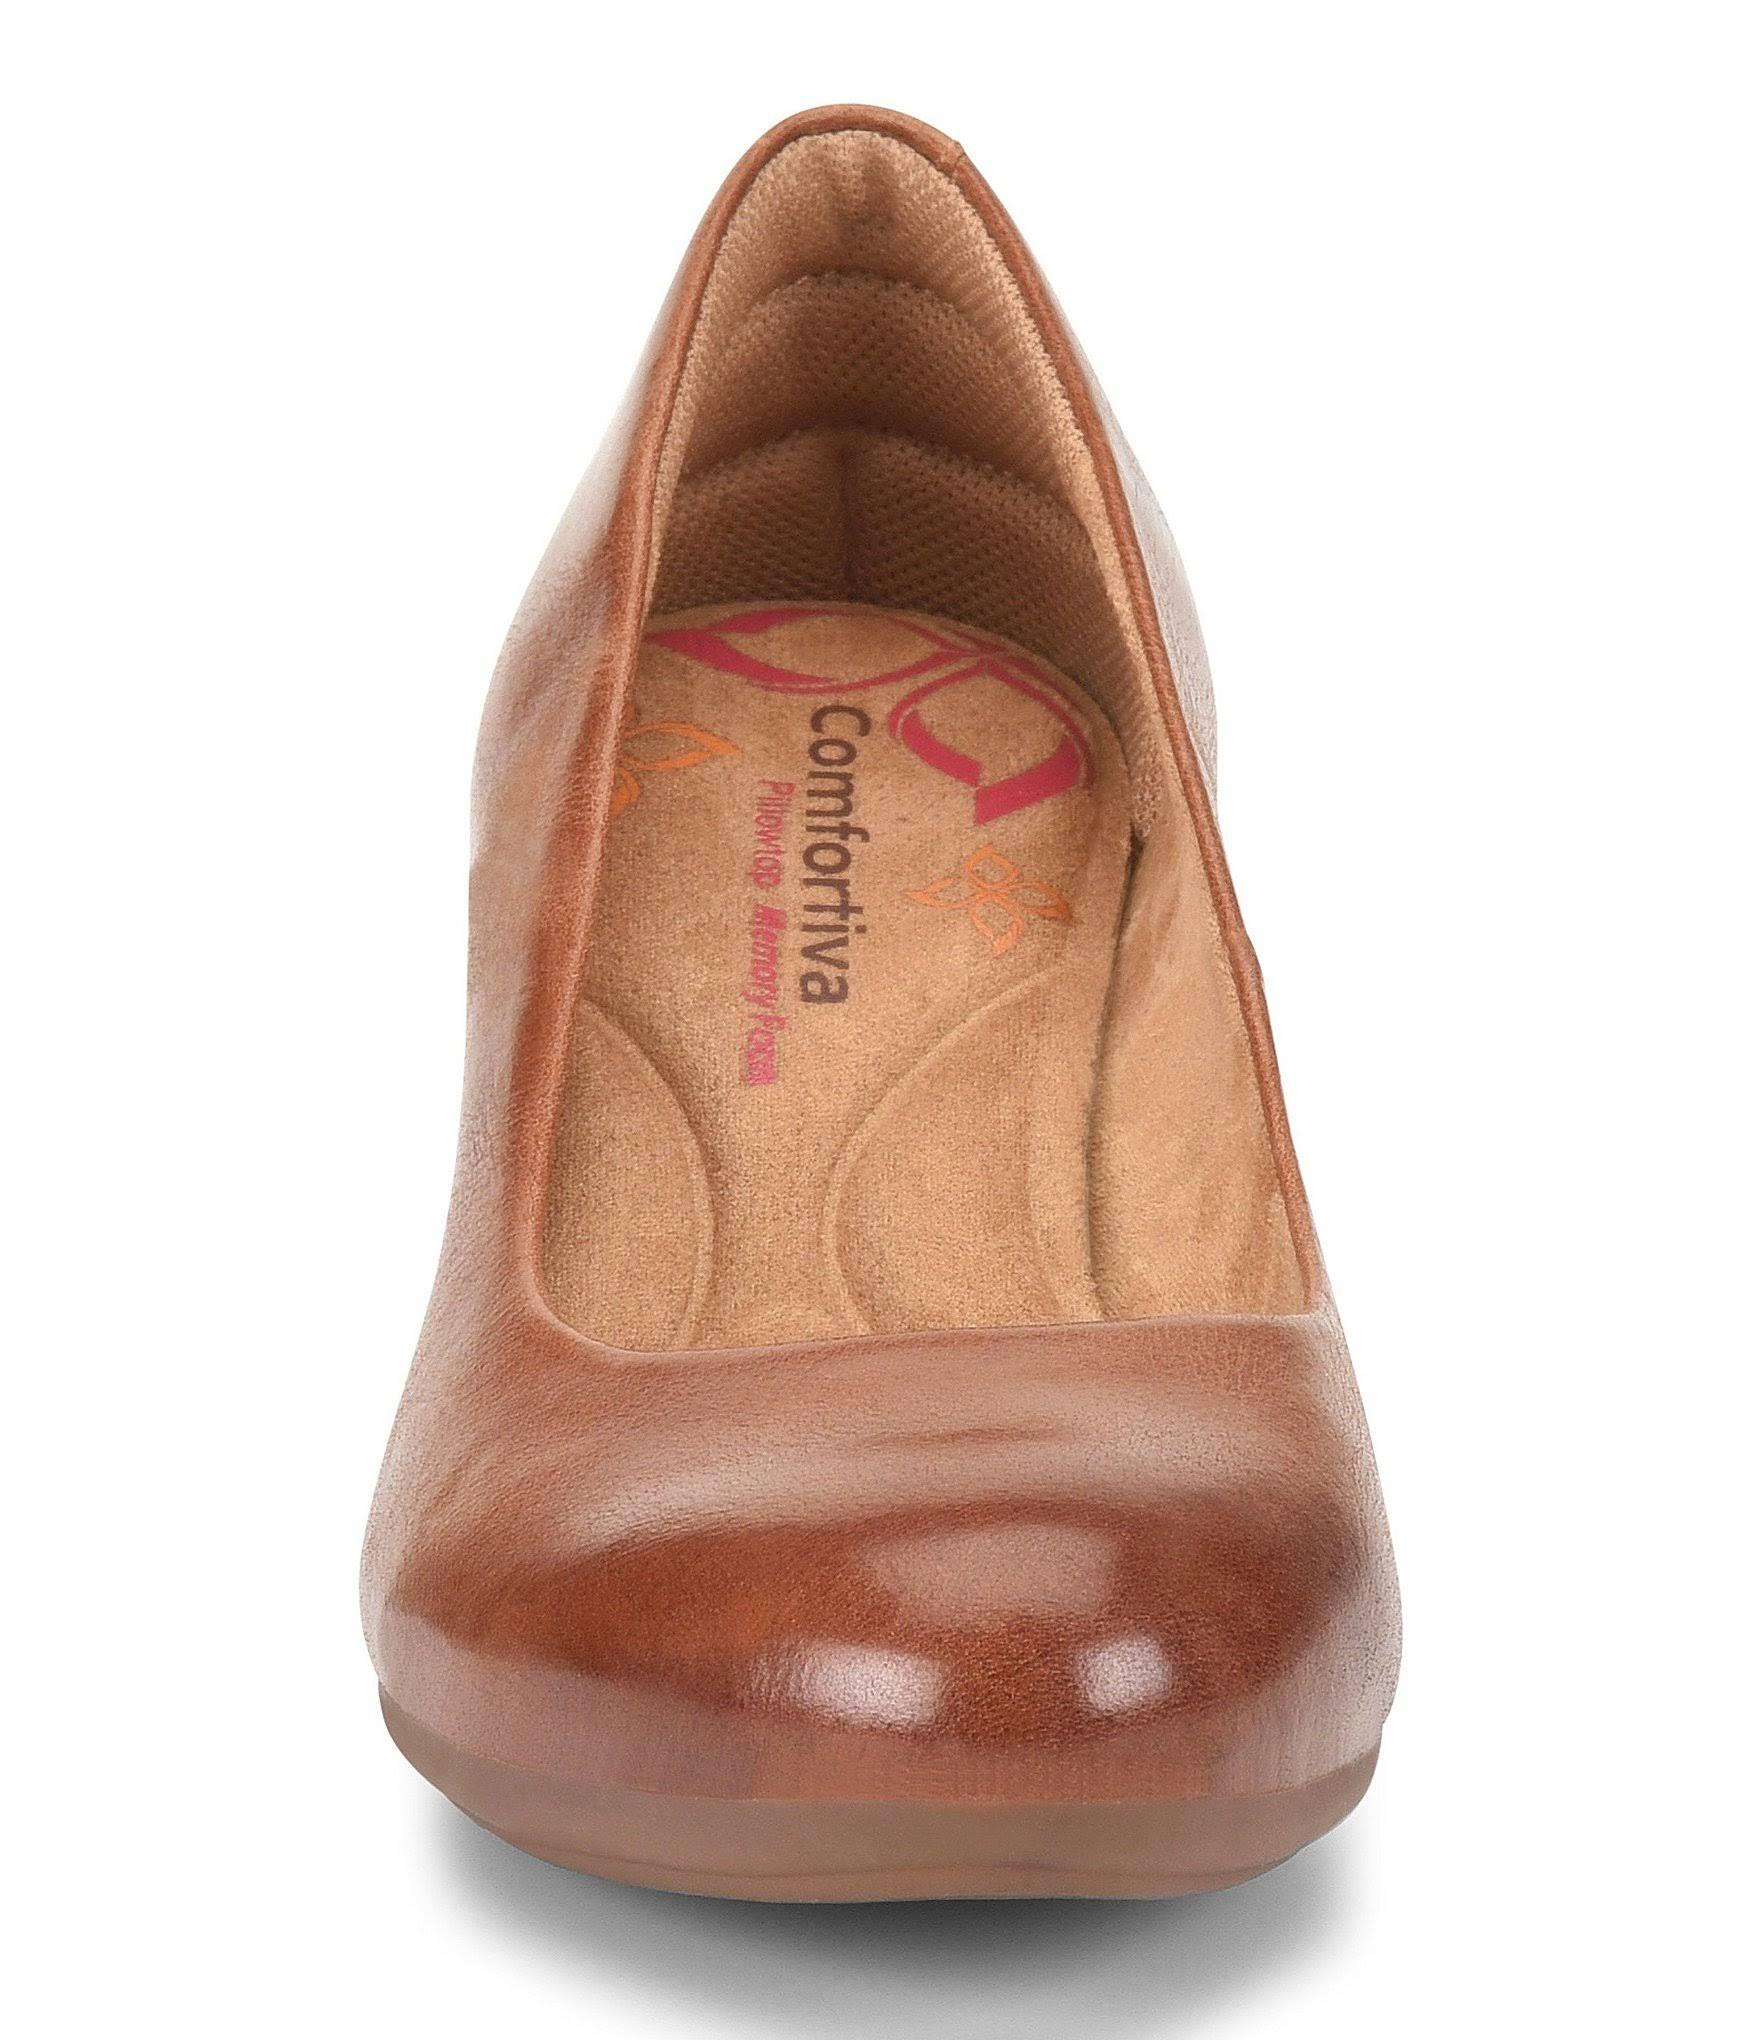 Dress Cork M 6 5 Comfortiva Amora Shoes OPw8n0k